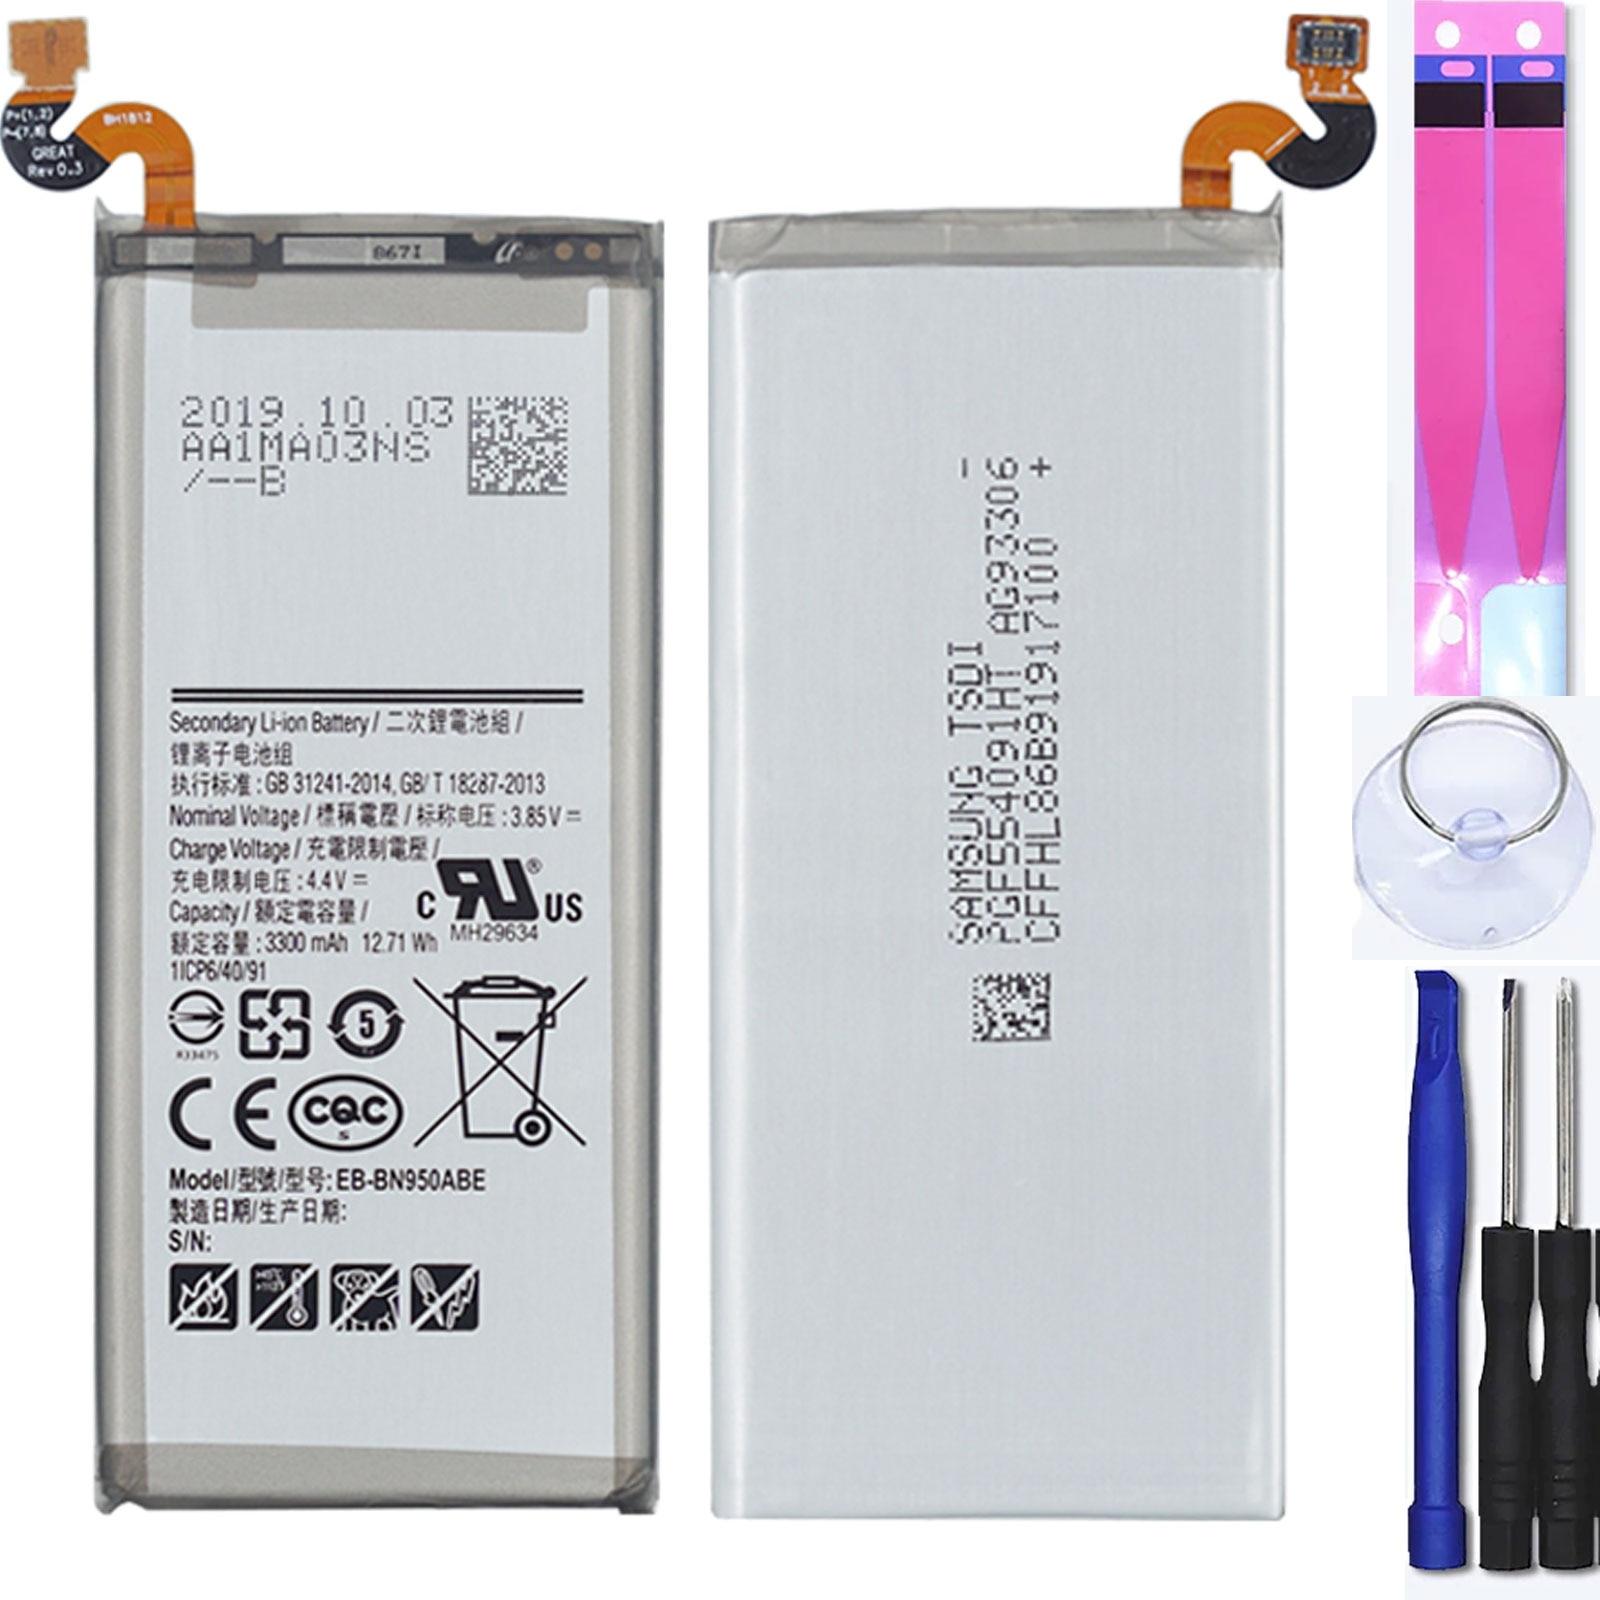 Встроенный аккумулятор для Samsung Galaxy Note 8 N950F - MPN оригинальный EB-BN950ABE